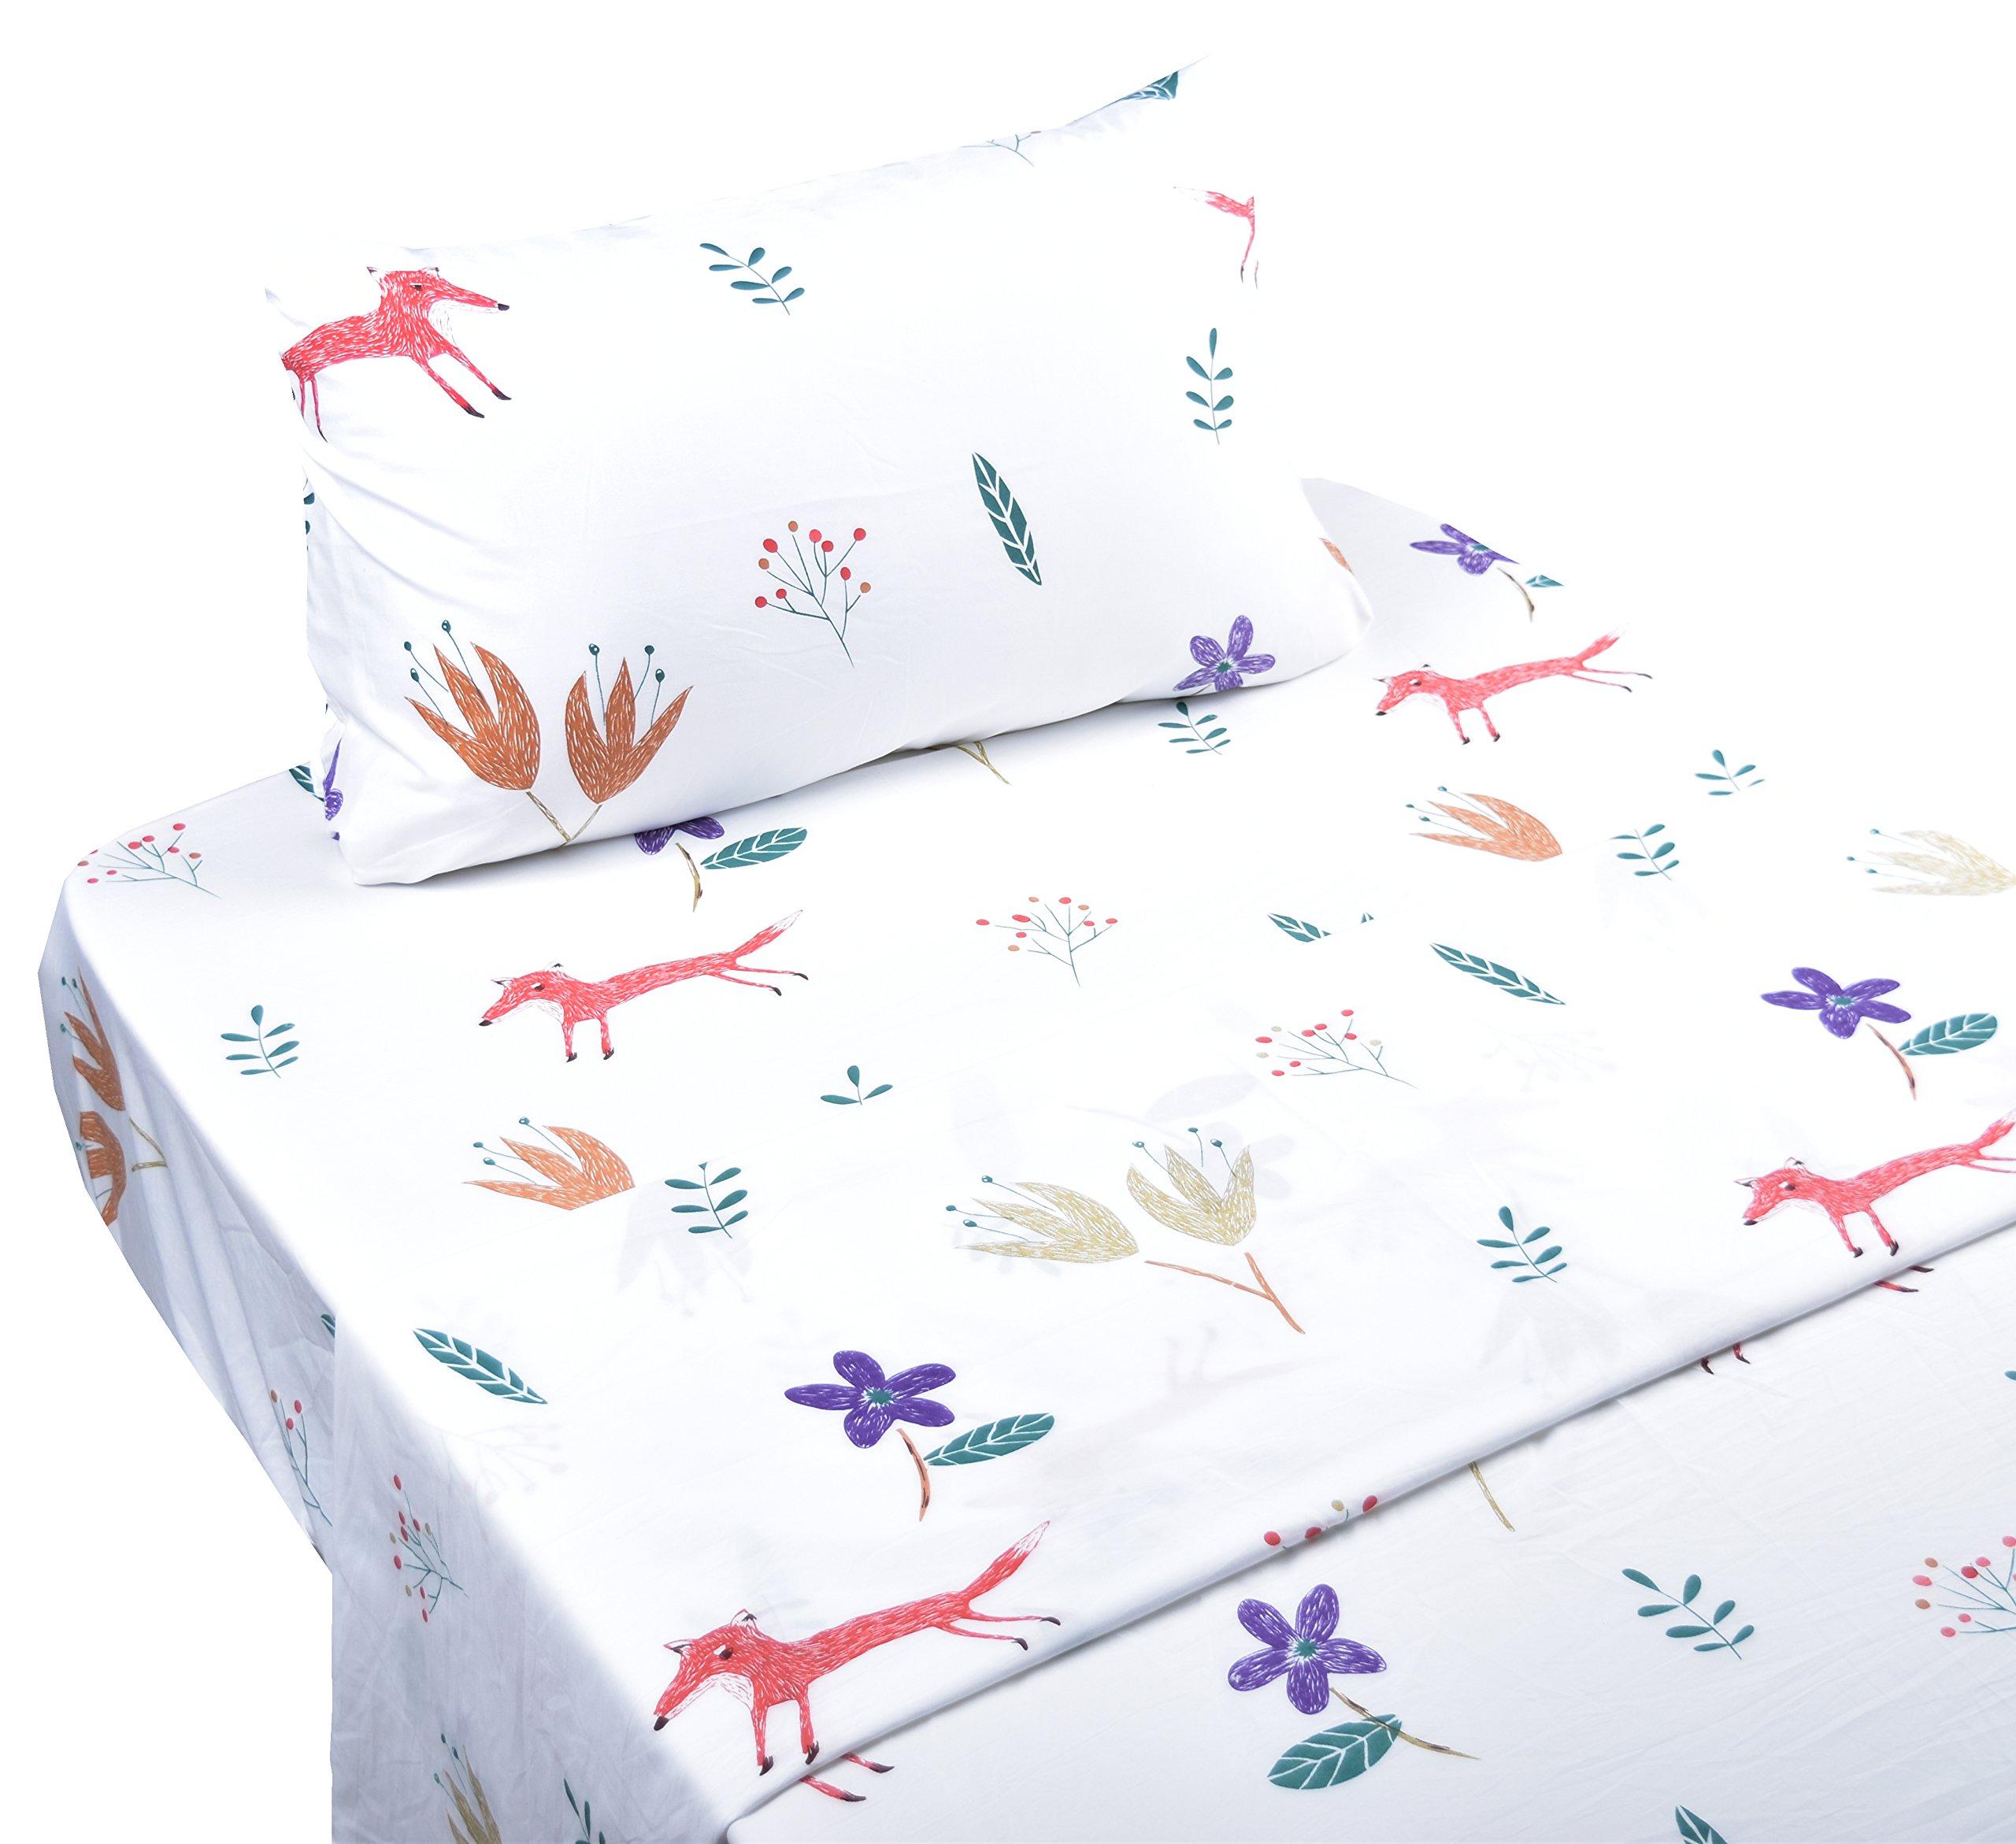 Scientific Sleep Cute Fox & Flowers Soft Sheets Set Twin, 100% Microfiber Polyester Bedding Sheet Set for Girls GIft (5, Twin)